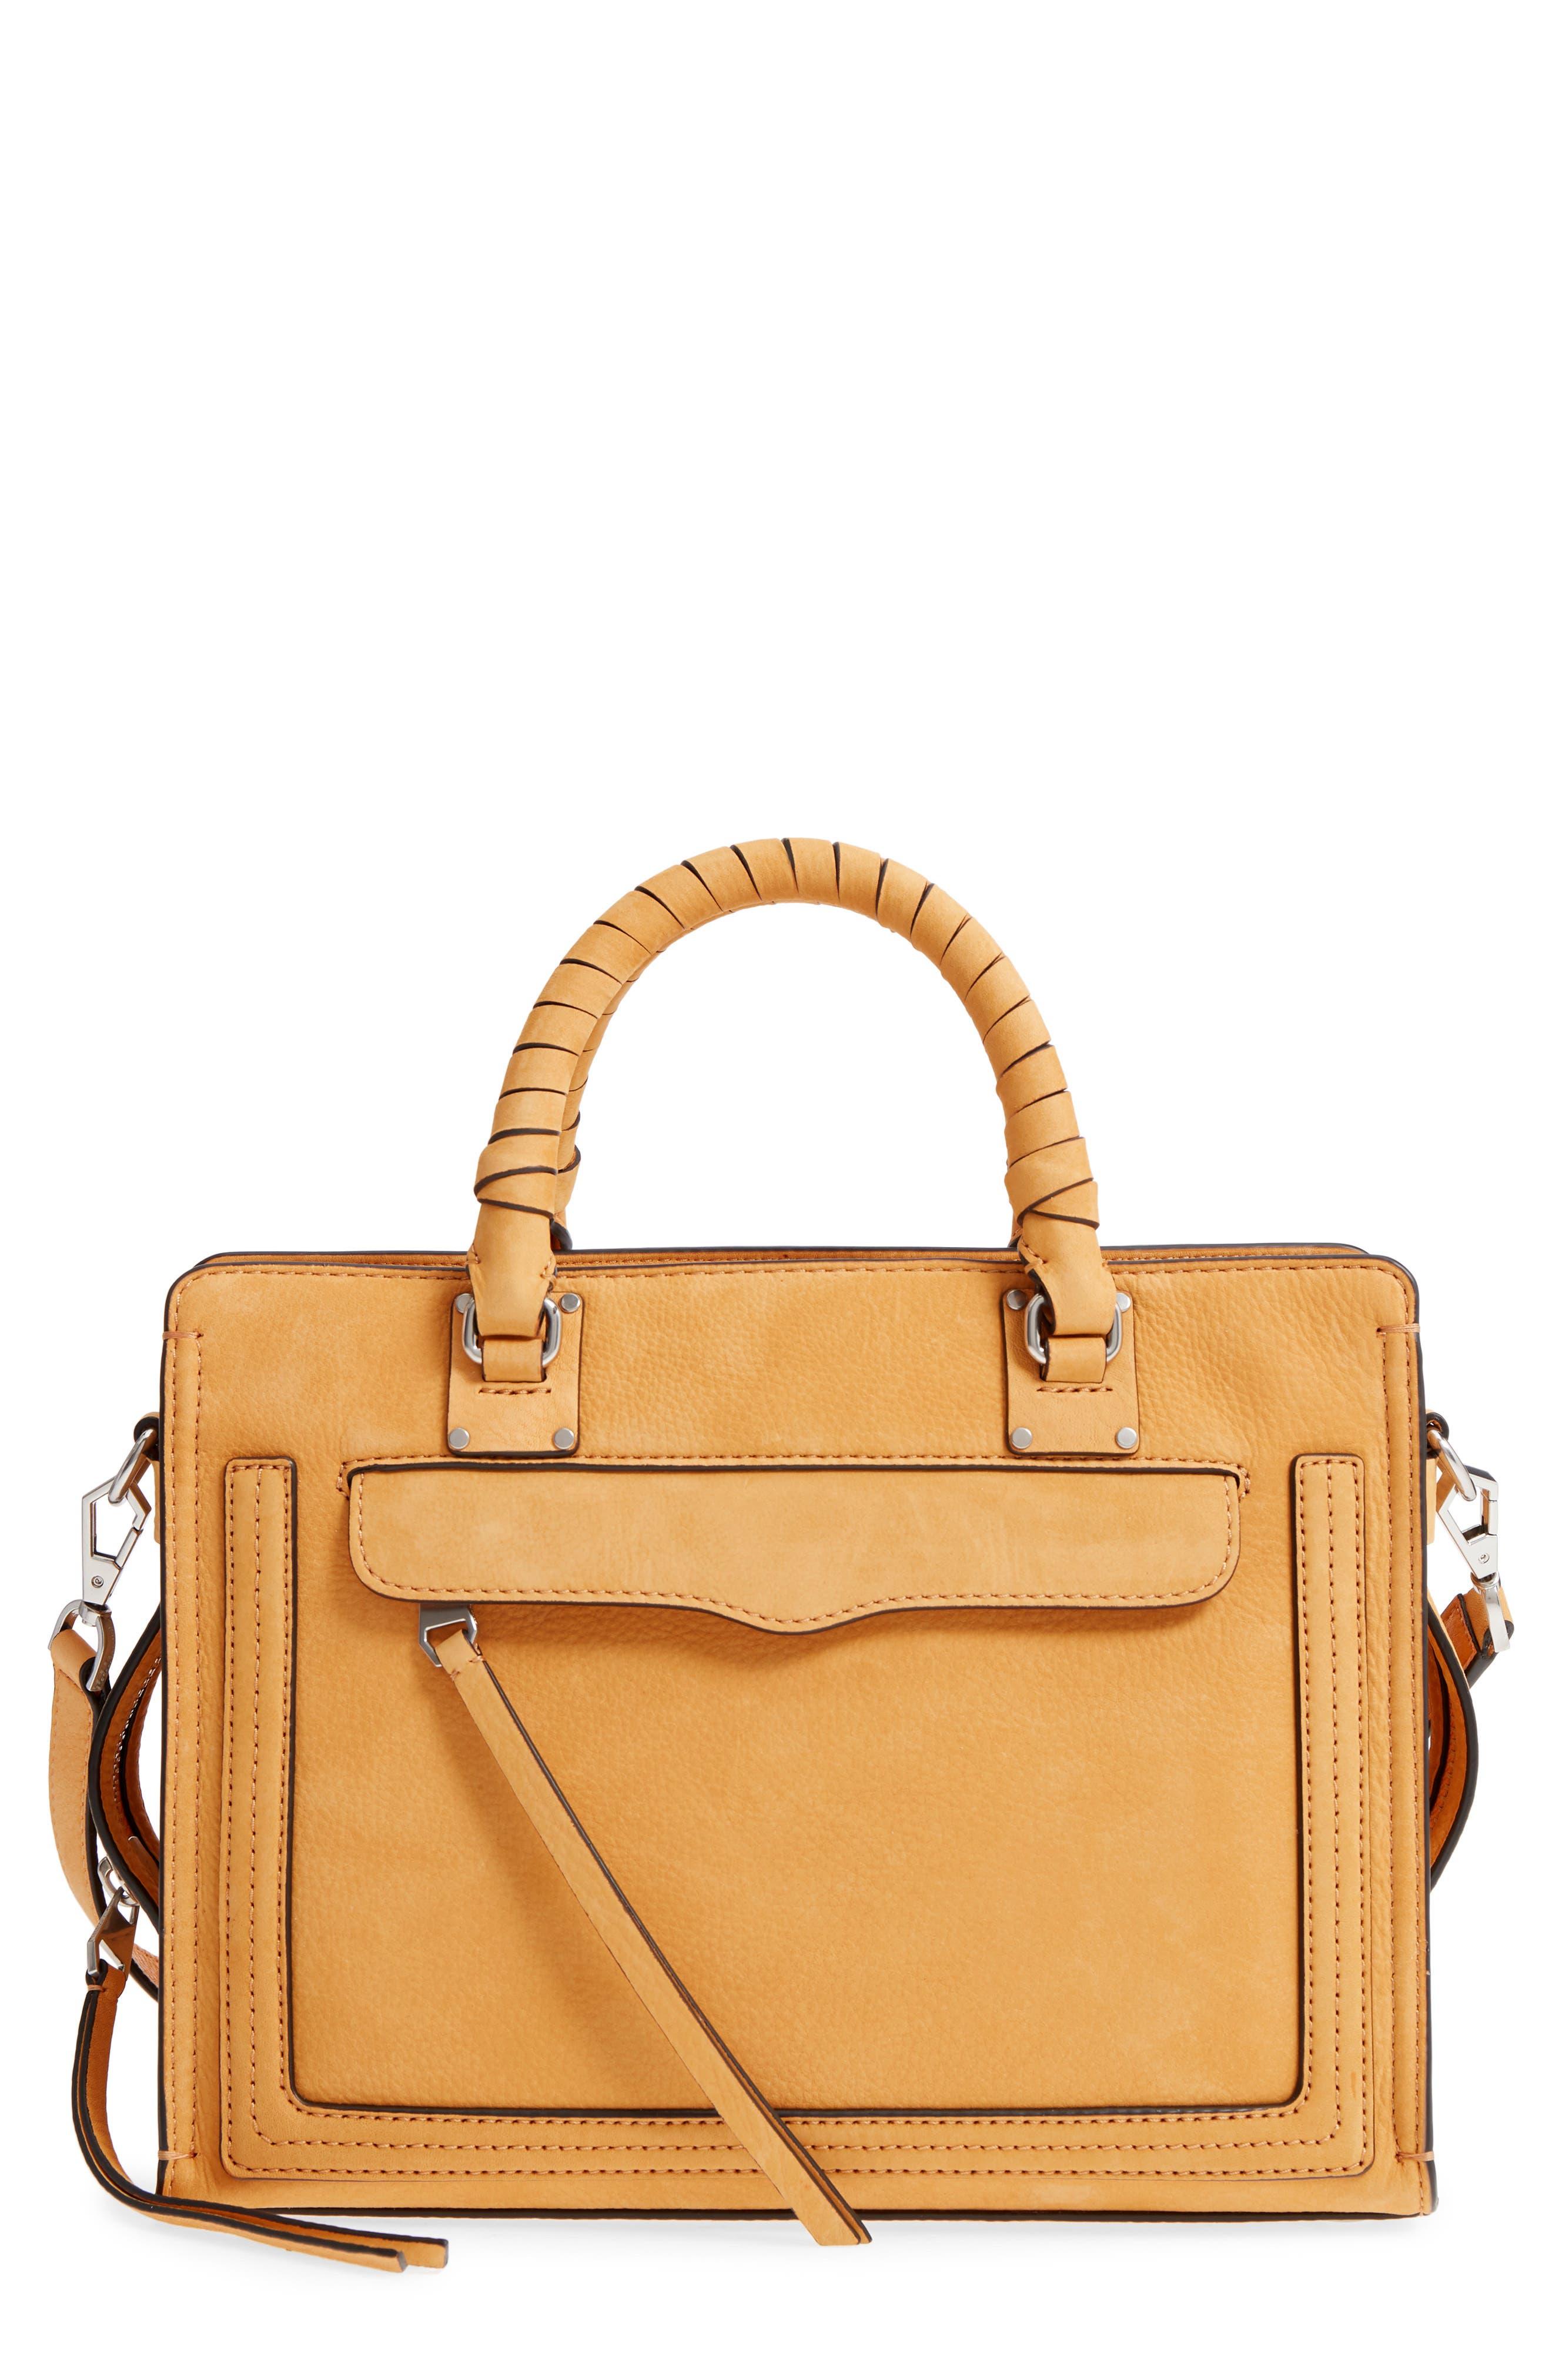 Rebecca Minkoff Medium Bree Leather Satchel